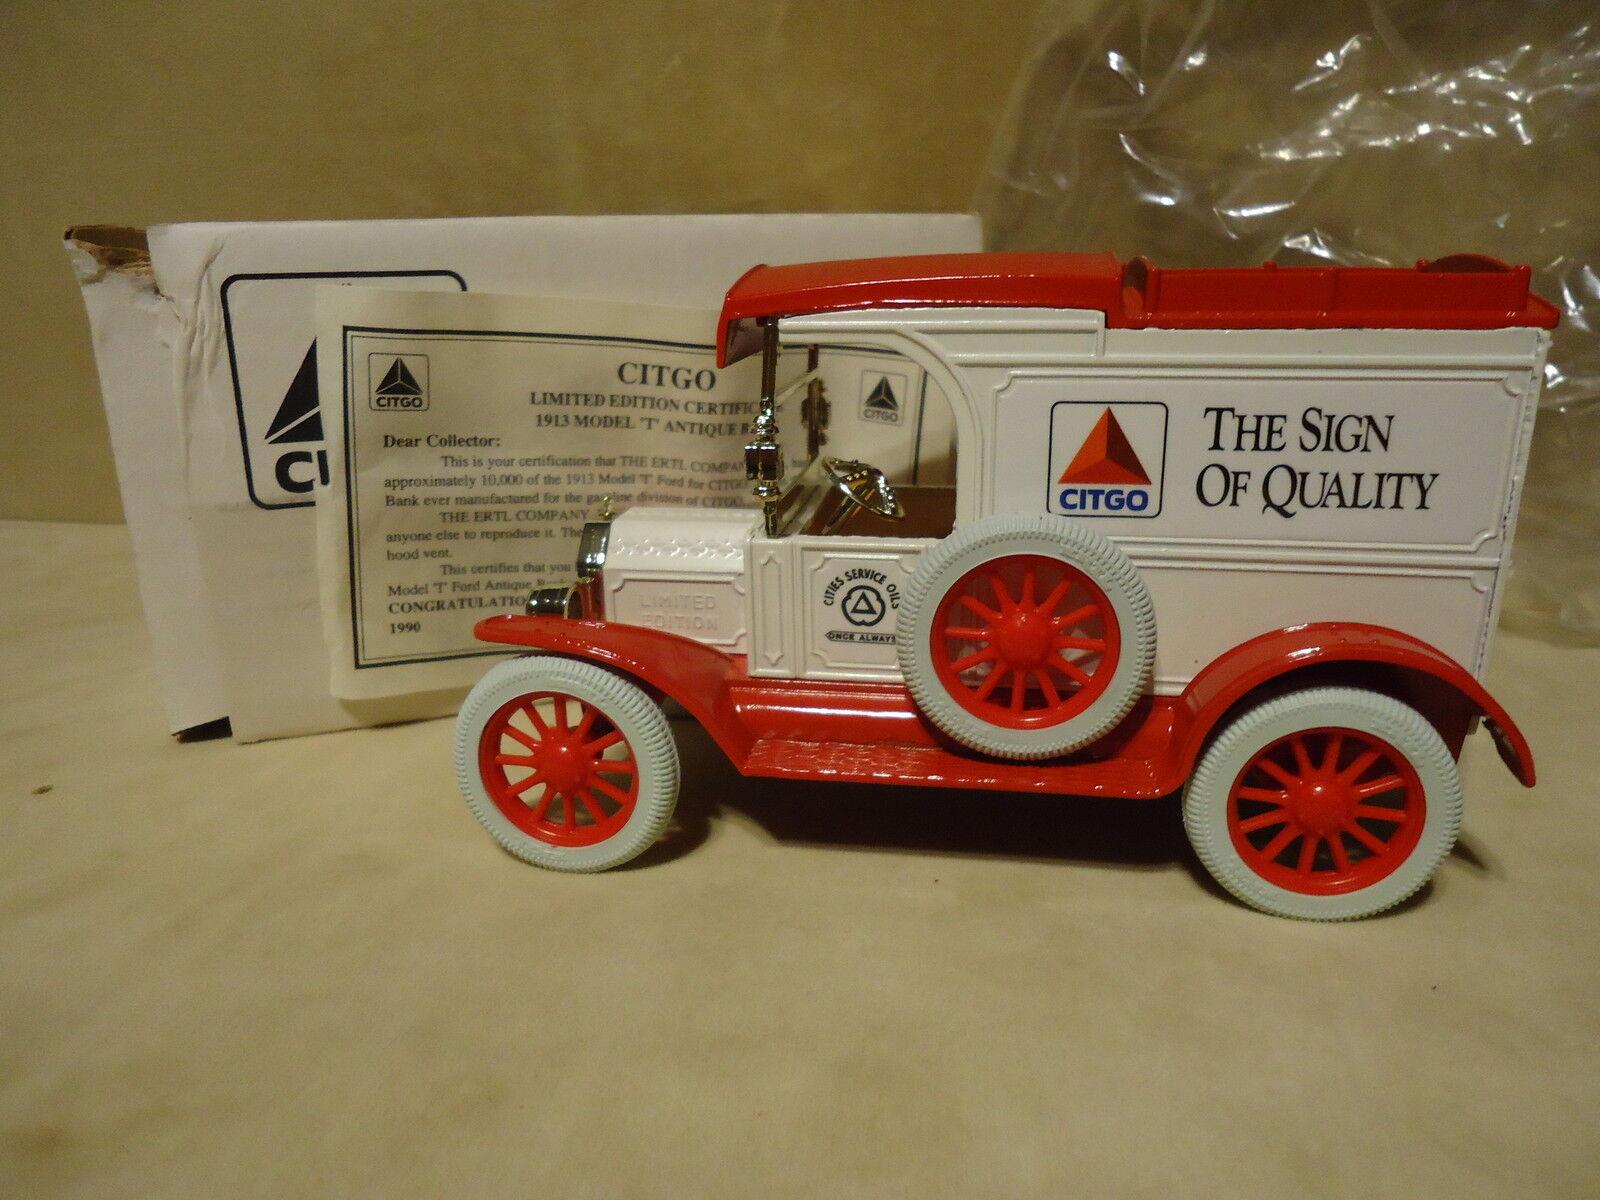 CITGO LUBRICANTS  4 MUSCULAR DYSTROPHY 1913 MODEL T  VAN  RARE STOCK   7537